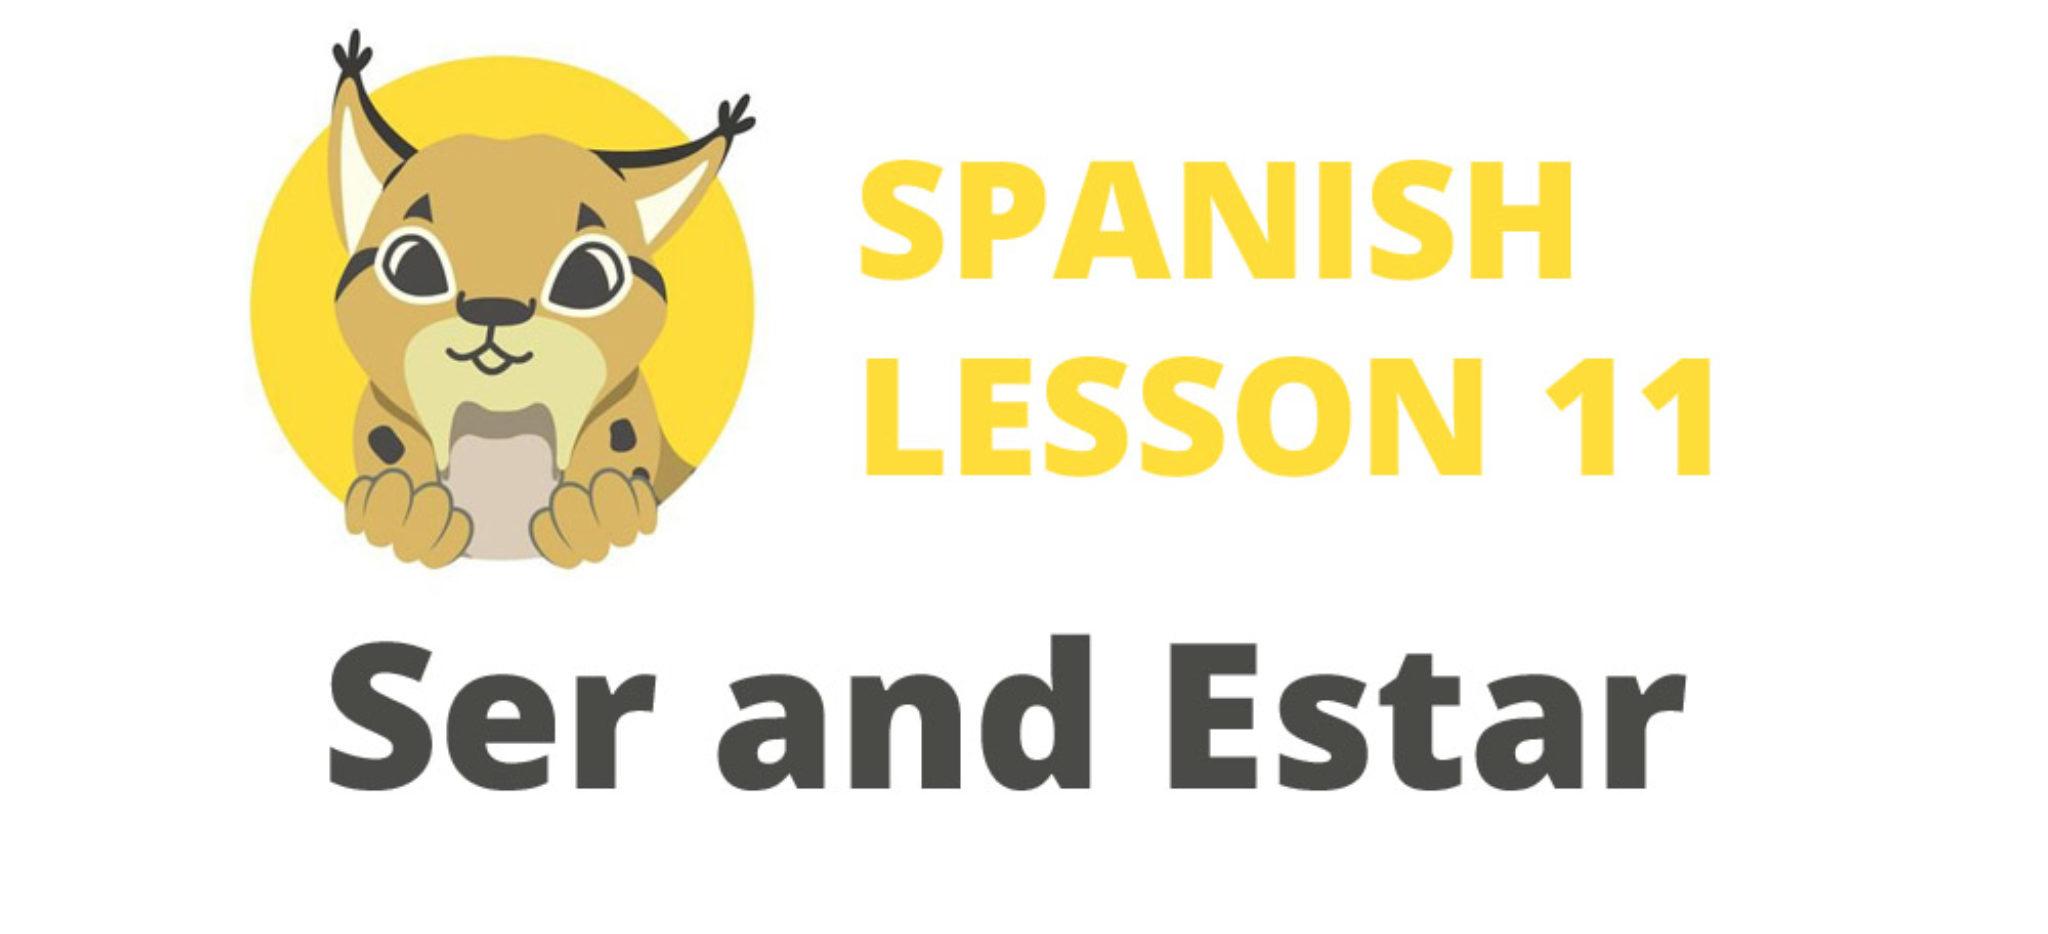 Spanish verbs Ser and Estar